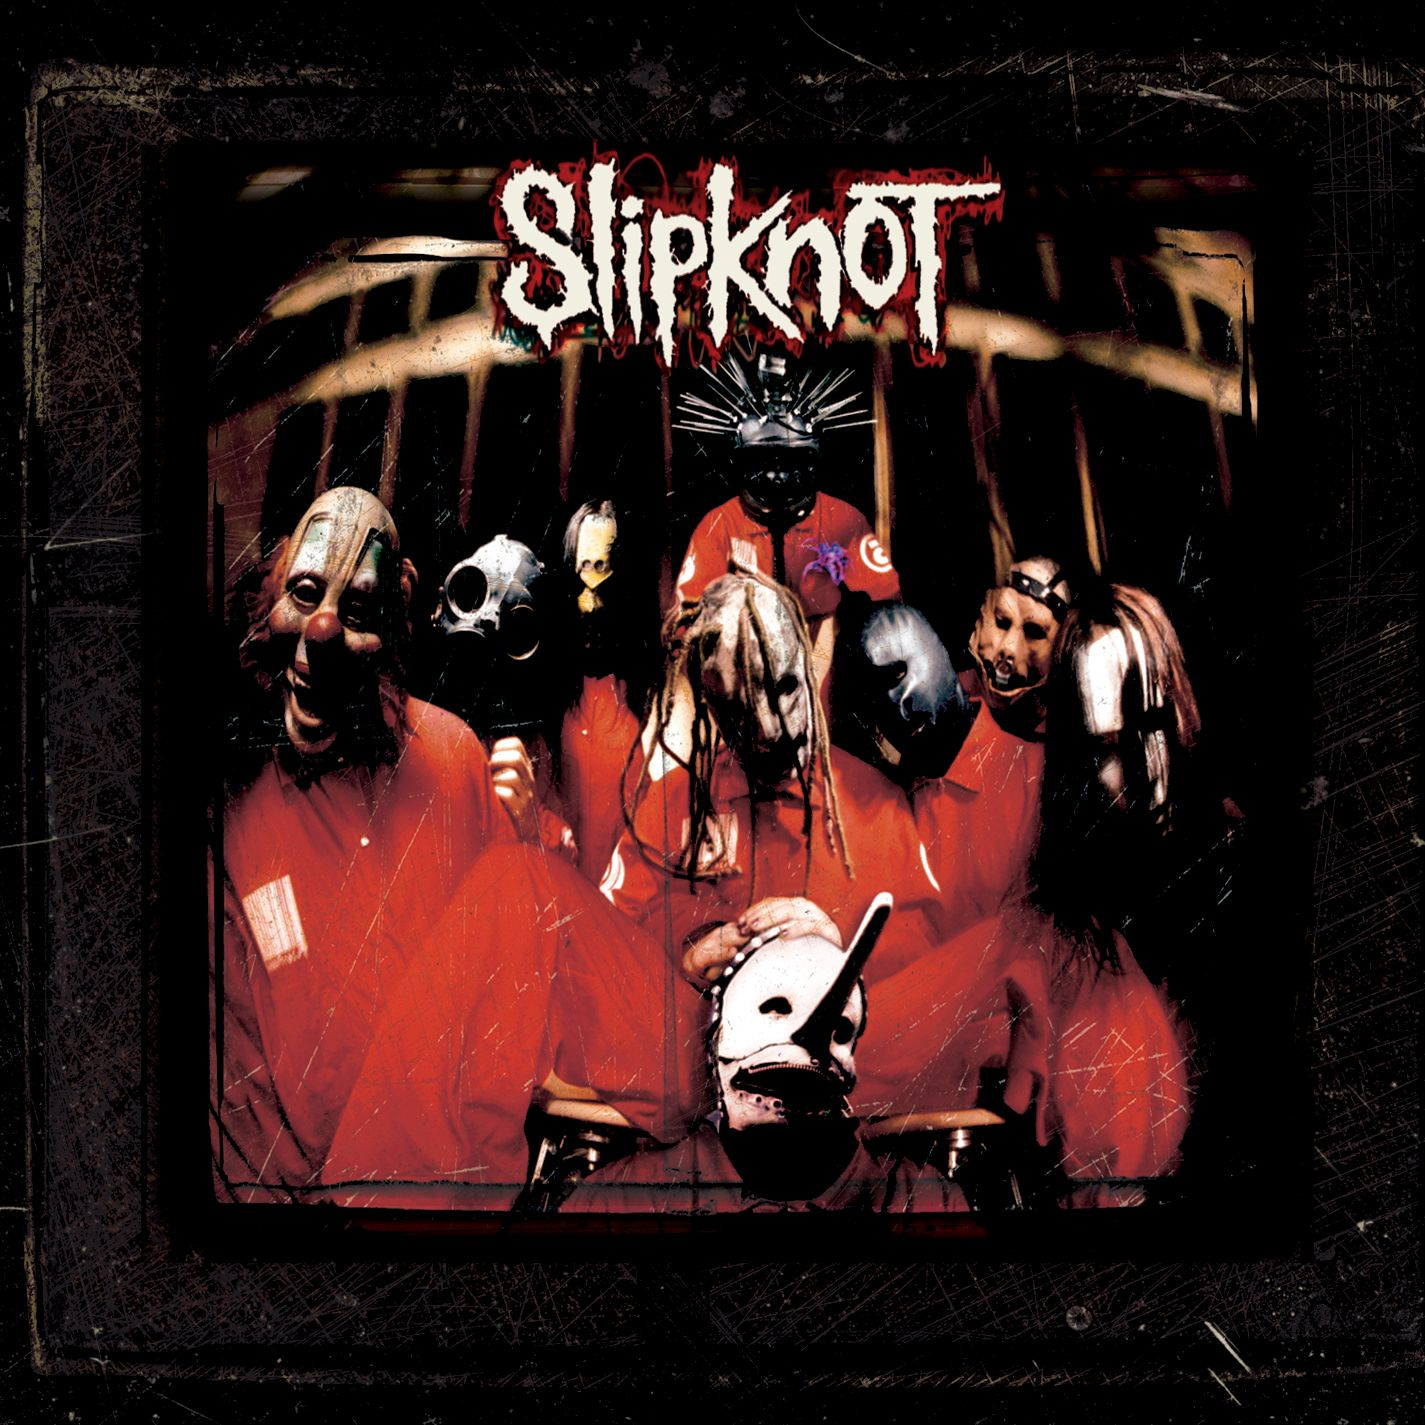 Music Discography: Slipknot - Slipknot 10th Anniversary ...